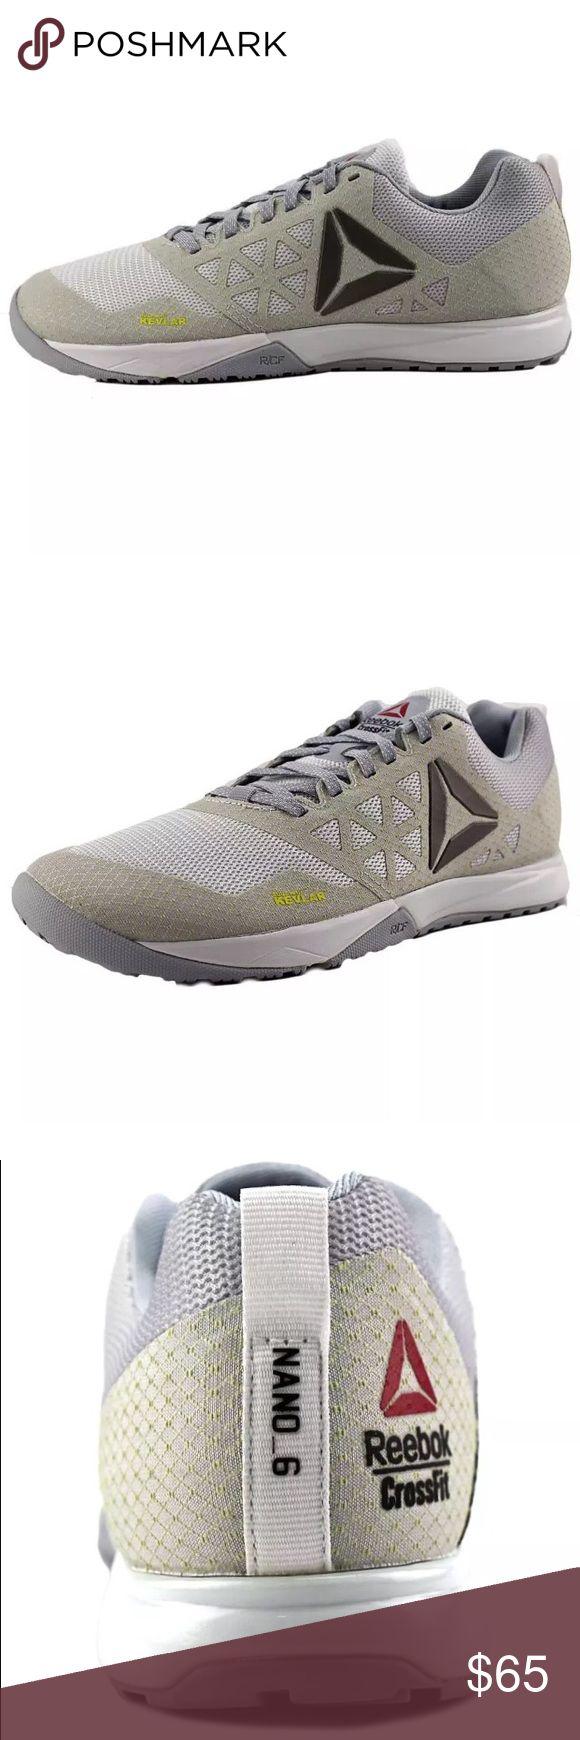 Reebok Nano 6 Reebok R Crossfit Nano 6.0 Round Toe Synthetic Cross Training Reebok Shoes Athletic Shoes